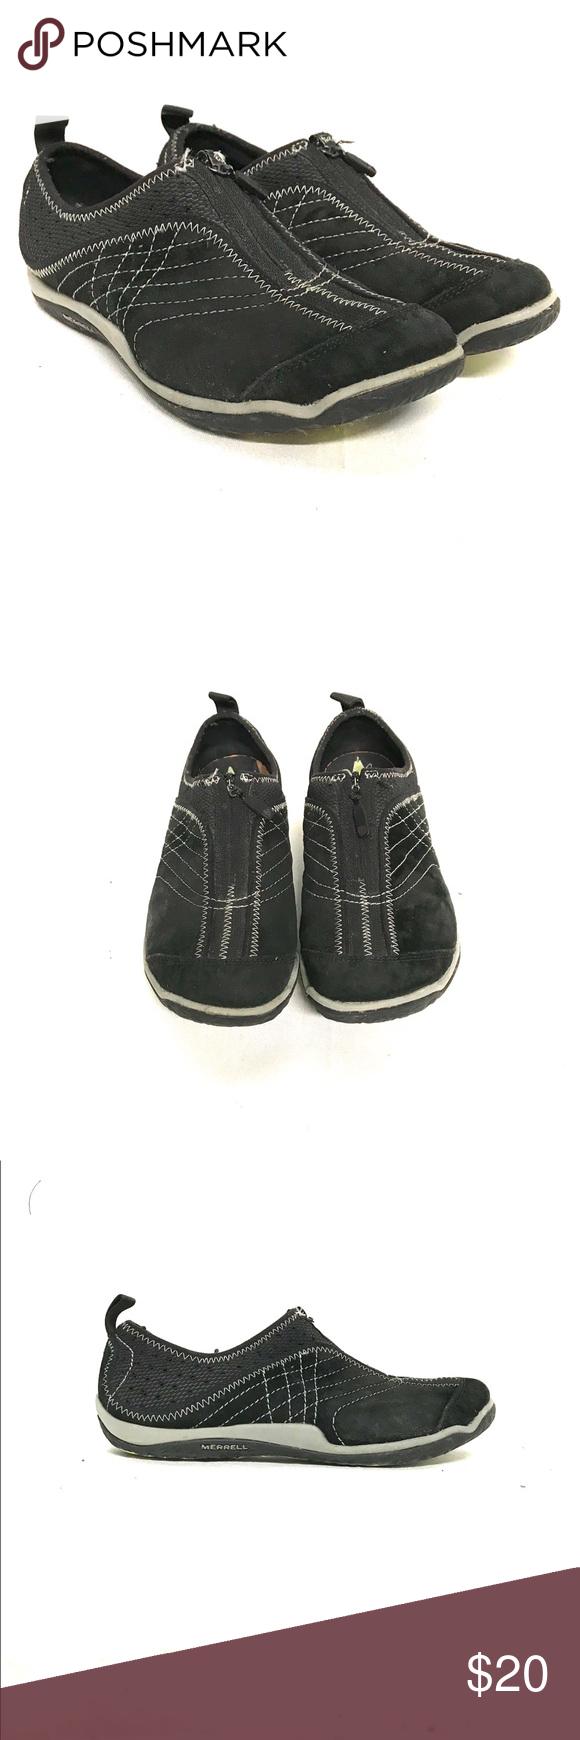 231cd302df Merrell zip top sneaker The greatest comfort brand-Merrell. Little walking  athletic shoe with the most comfortable insole ever. Zip top.